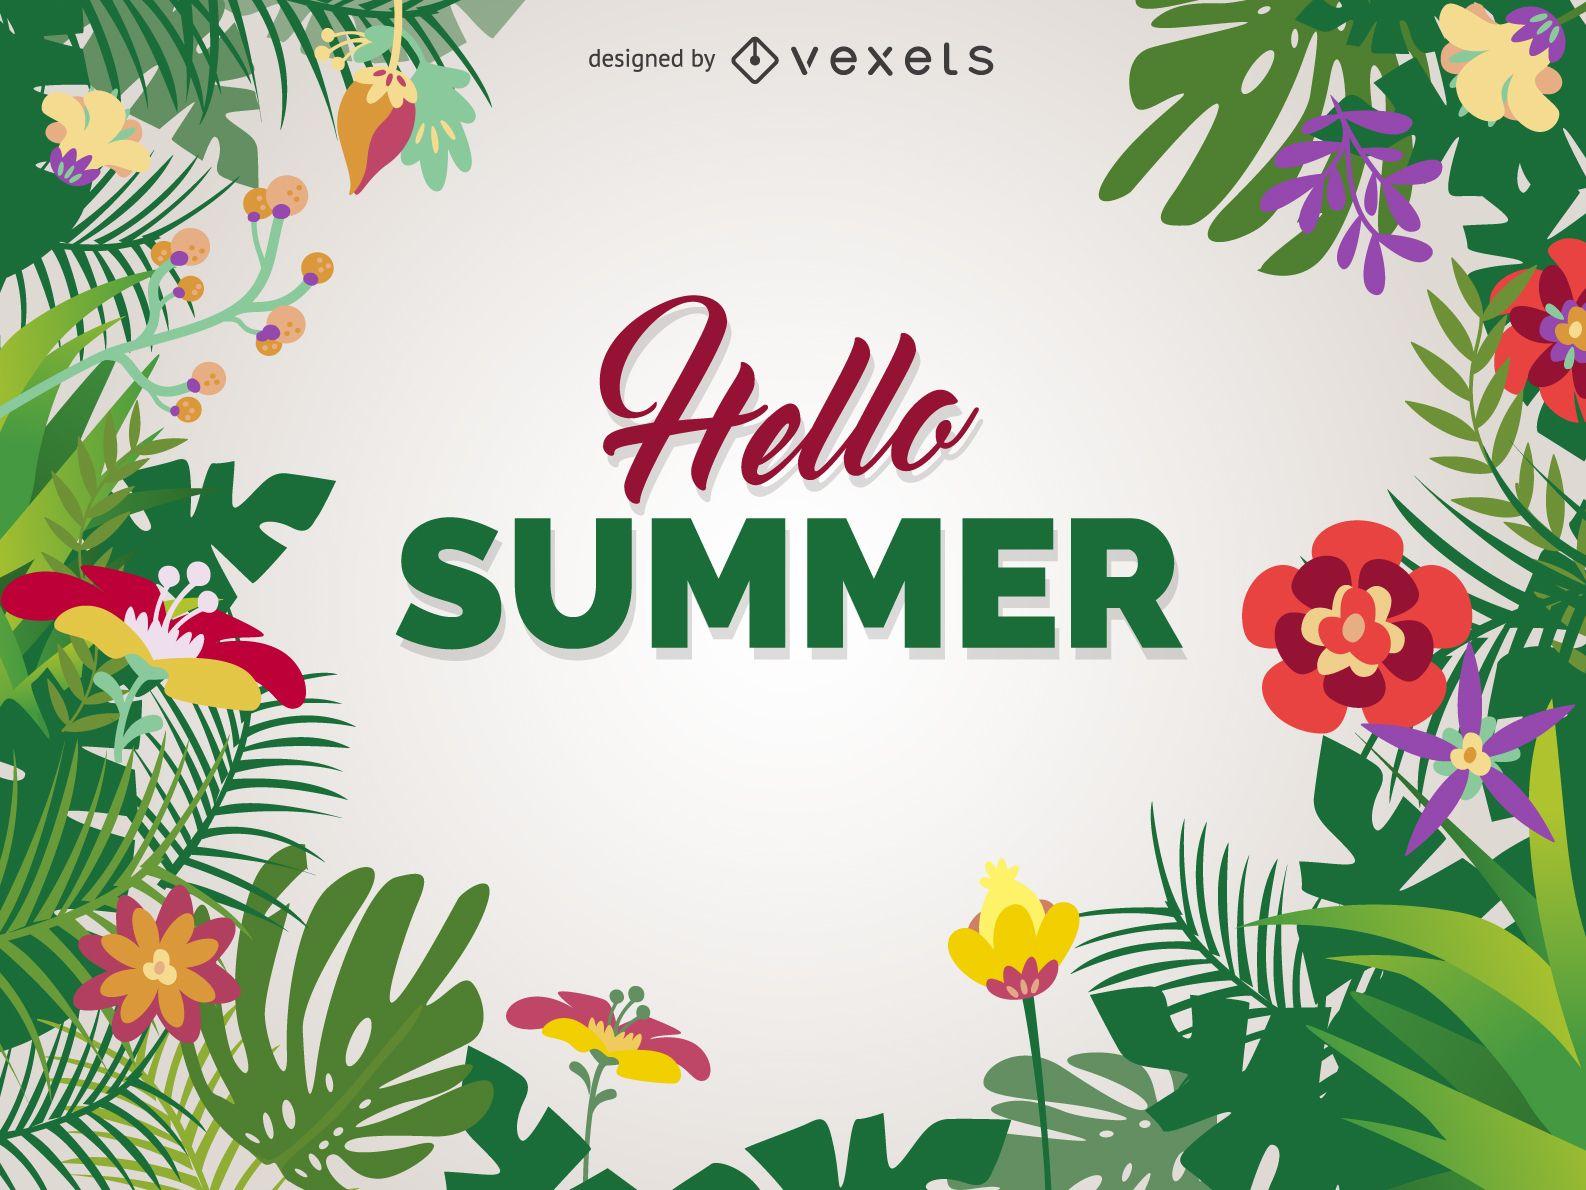 Hello summer poster design - Vector download